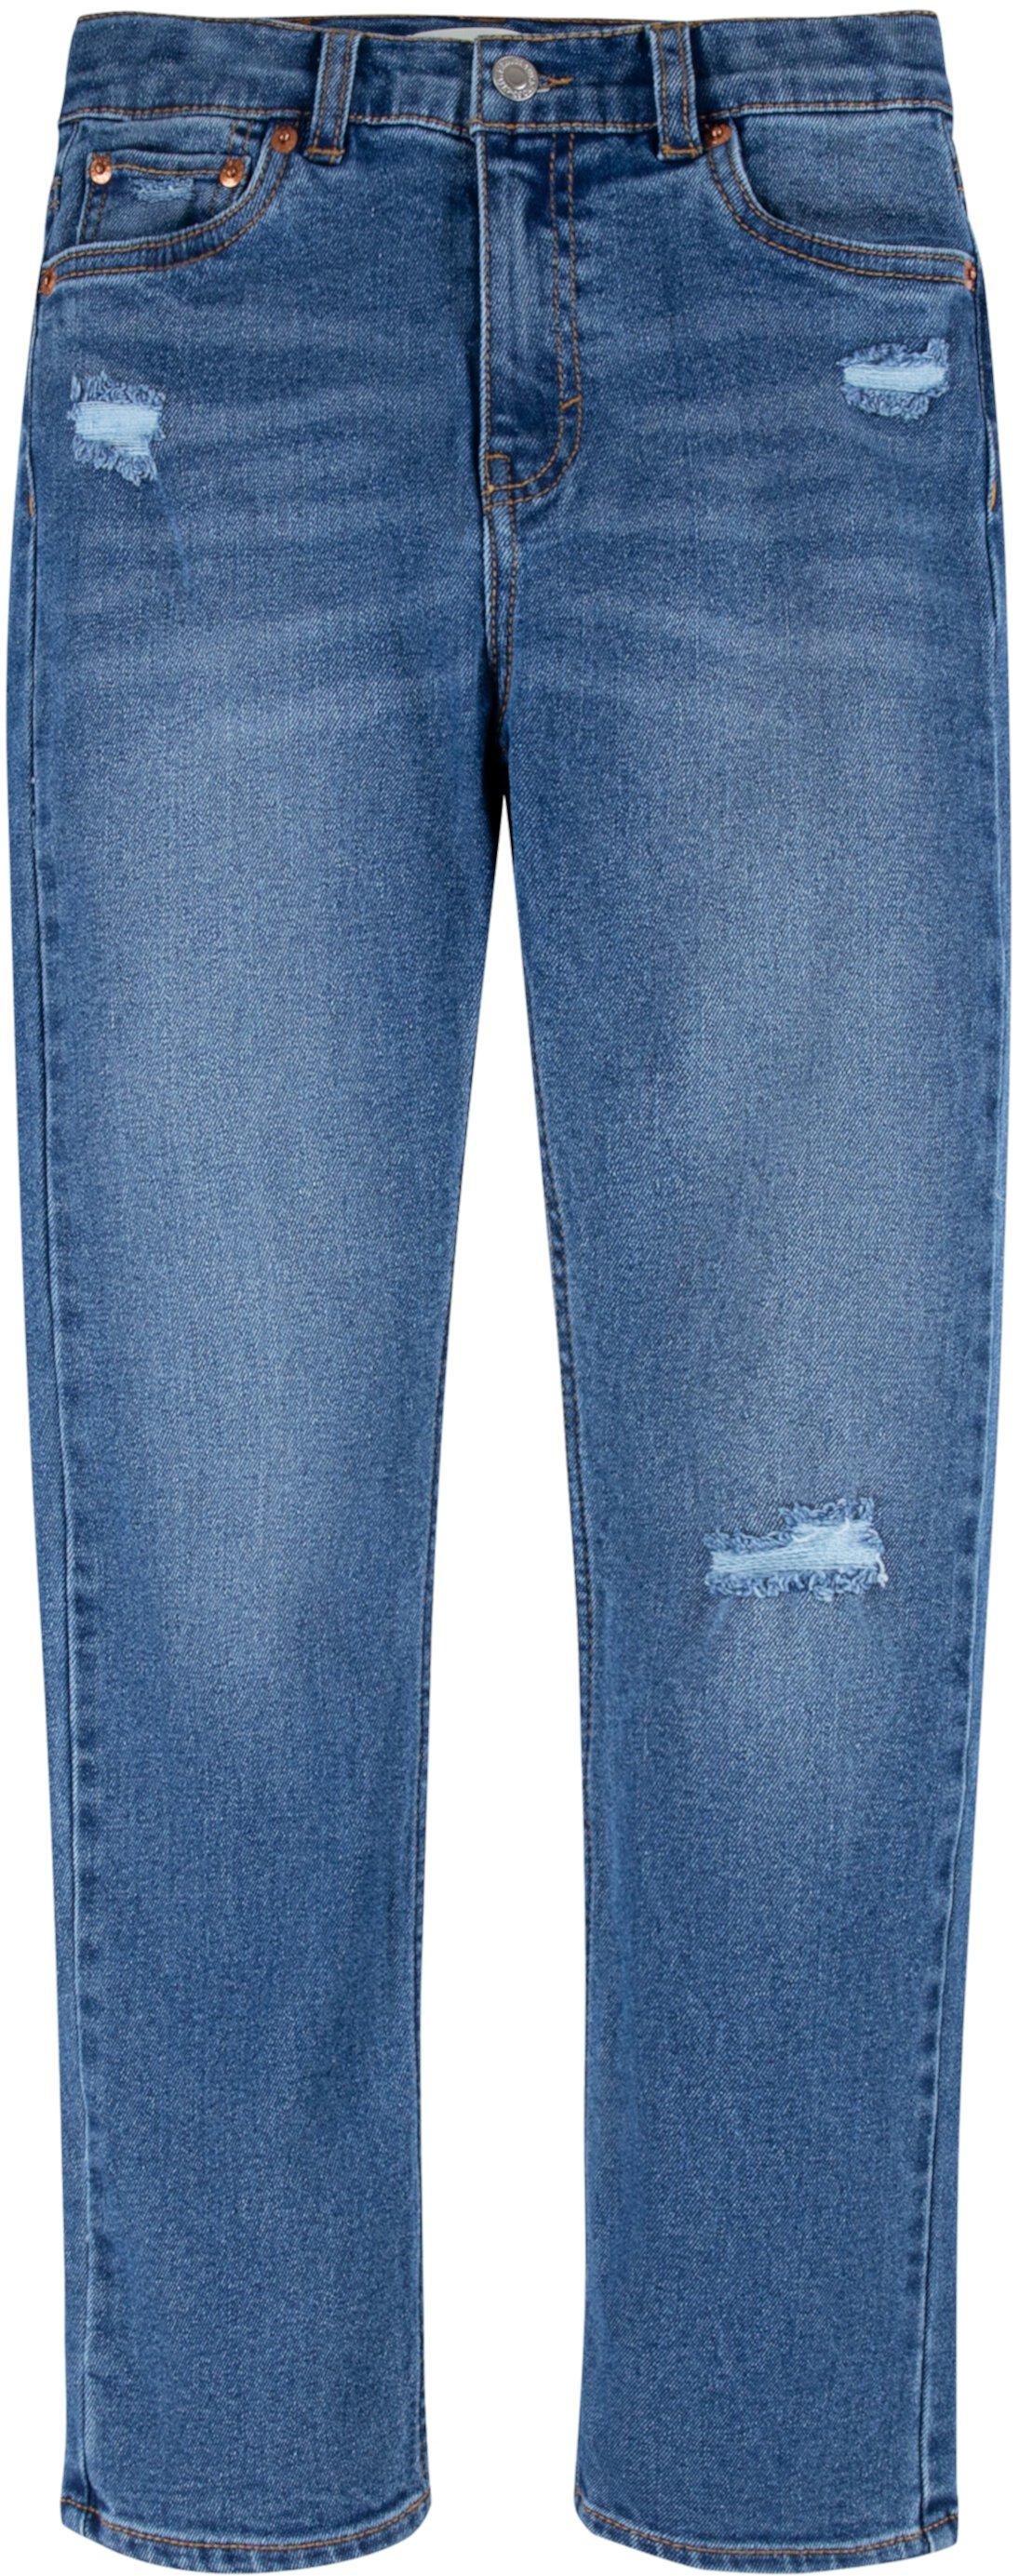 Loose Fit Jeans (Big Kids) Levi's®